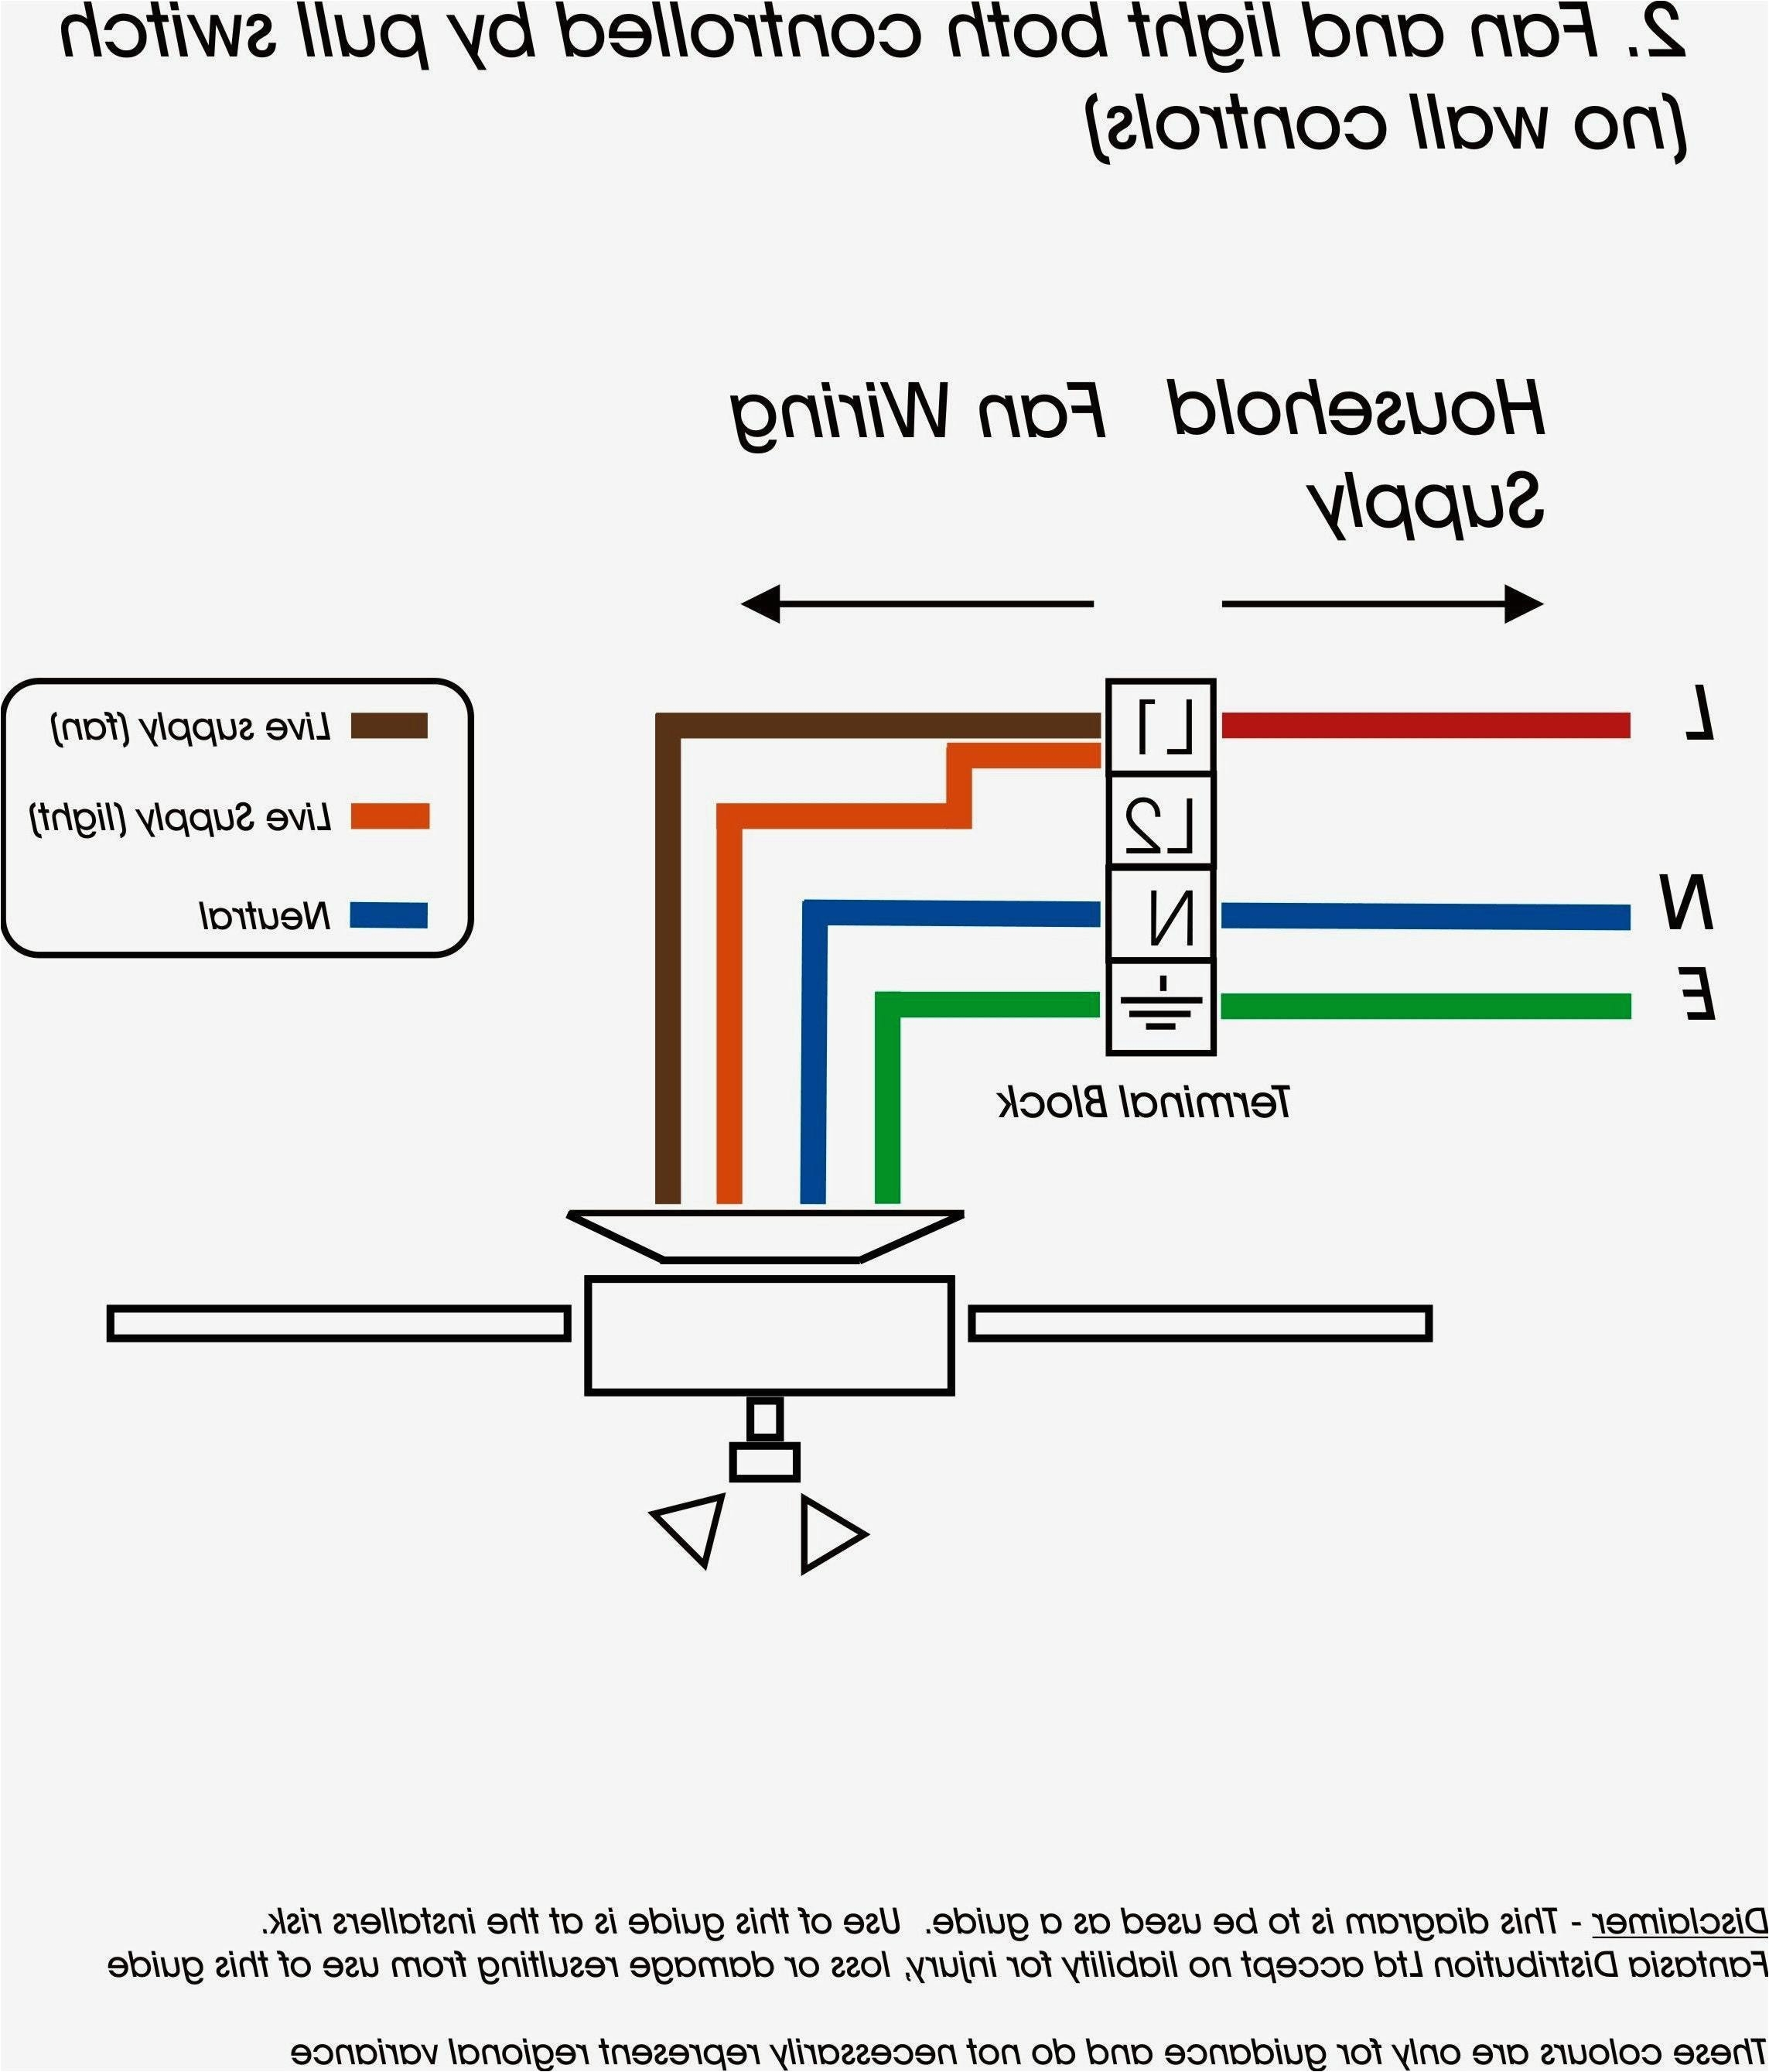 bremas boat lift switch wiring diagram free picture my wiring diagram aos boat lift switch wiring